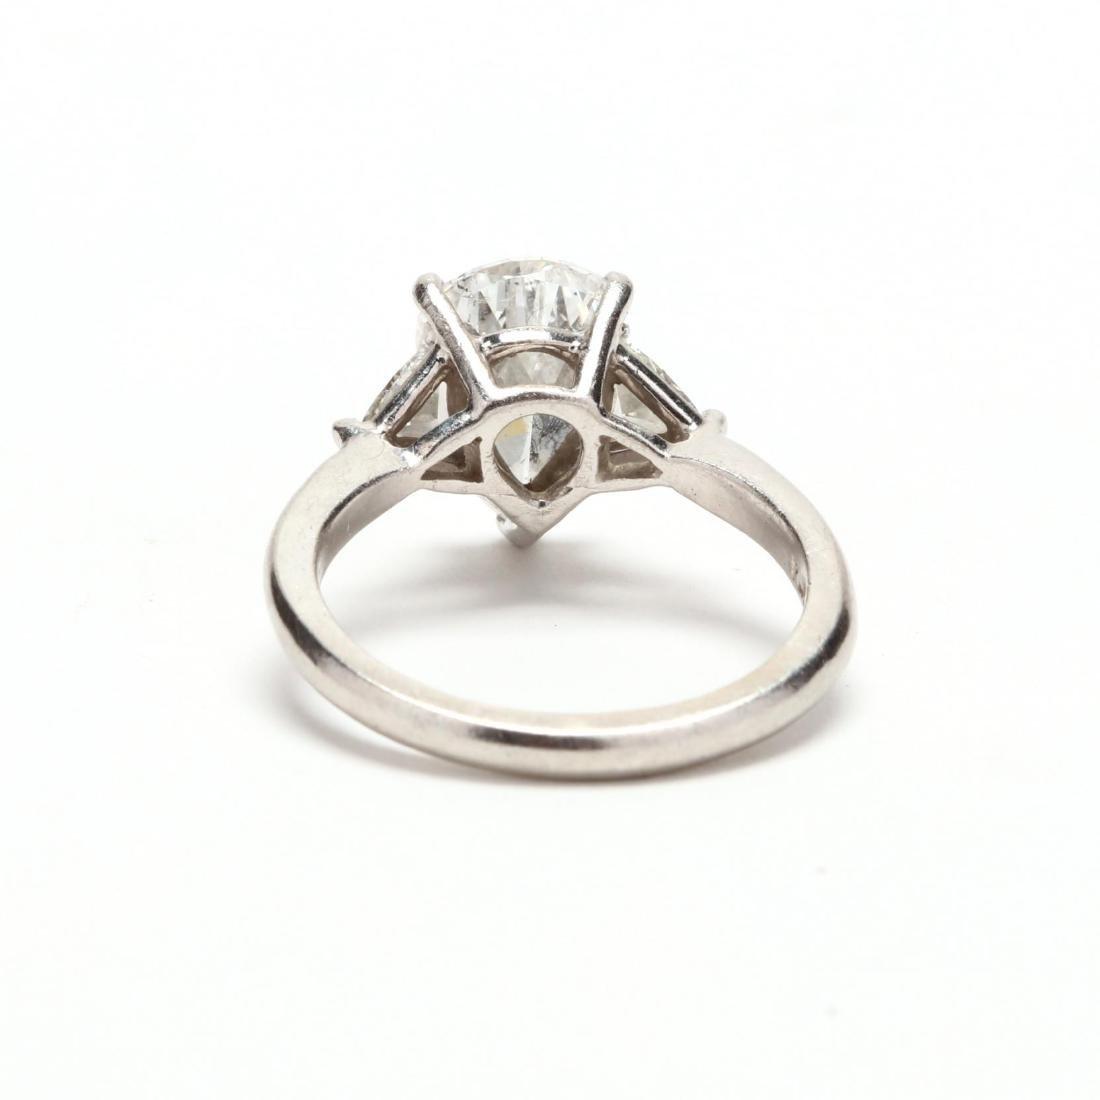 Unmounted Diamond with Platinum and Diamond Mount - 3